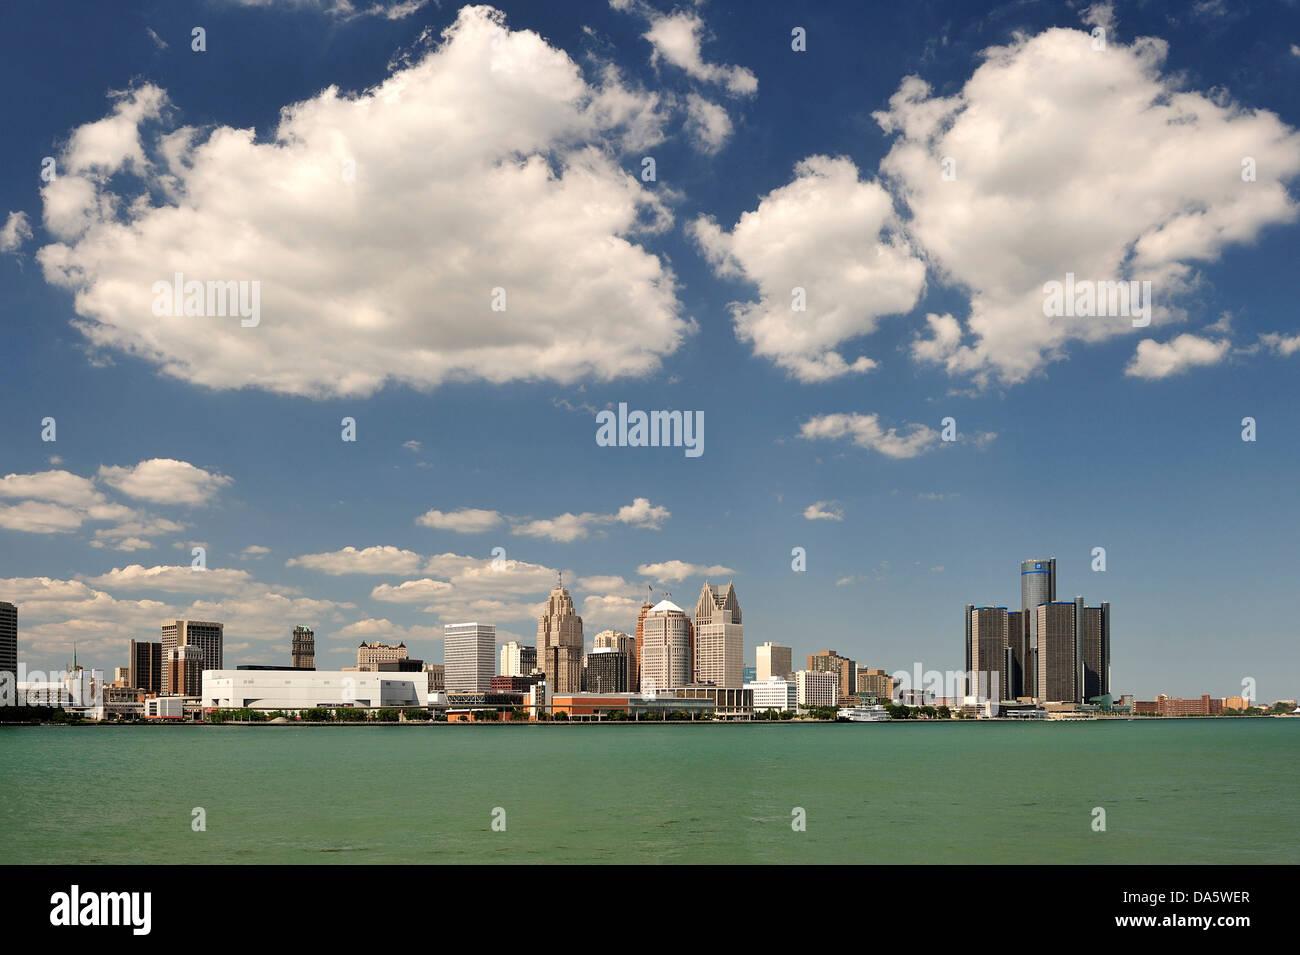 Clouds, Detroit, Detroit River, river, Financial District, General Motors, Great Lakes, International Riverfront, - Stock Image